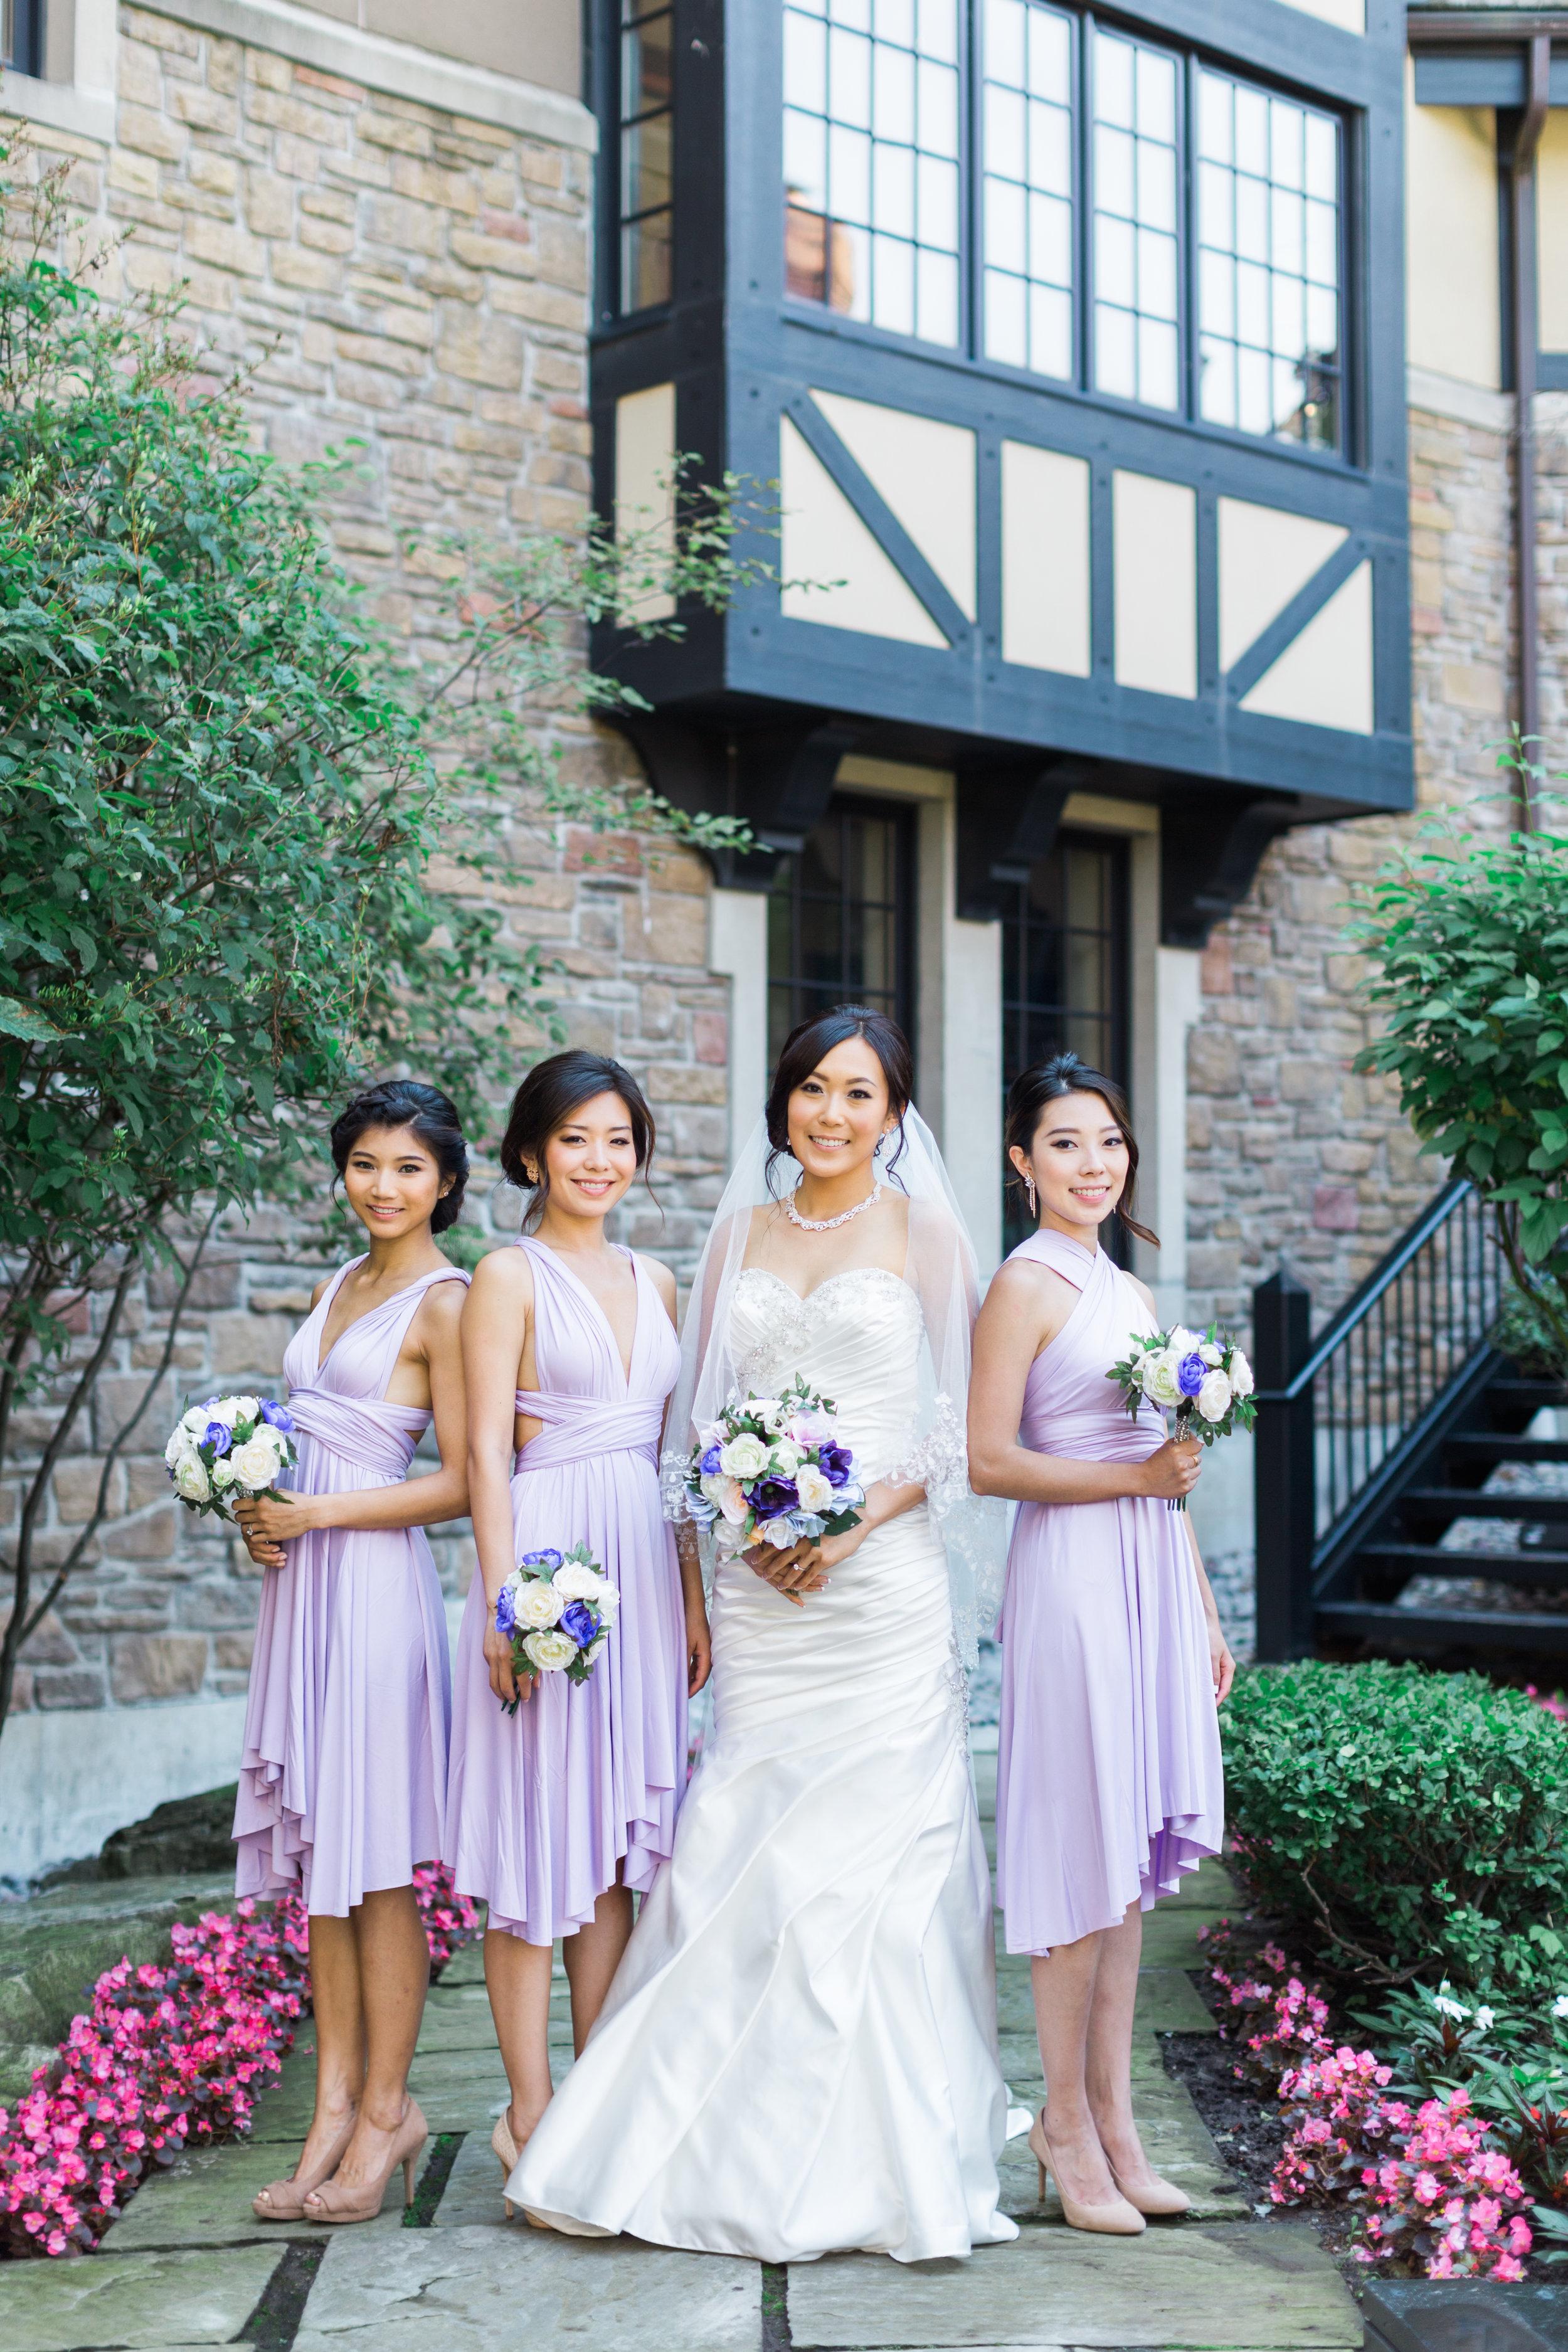 Toronto Fine Art Photographer - Old Mill Wedding - Bridesmaids Photos-2.jpg